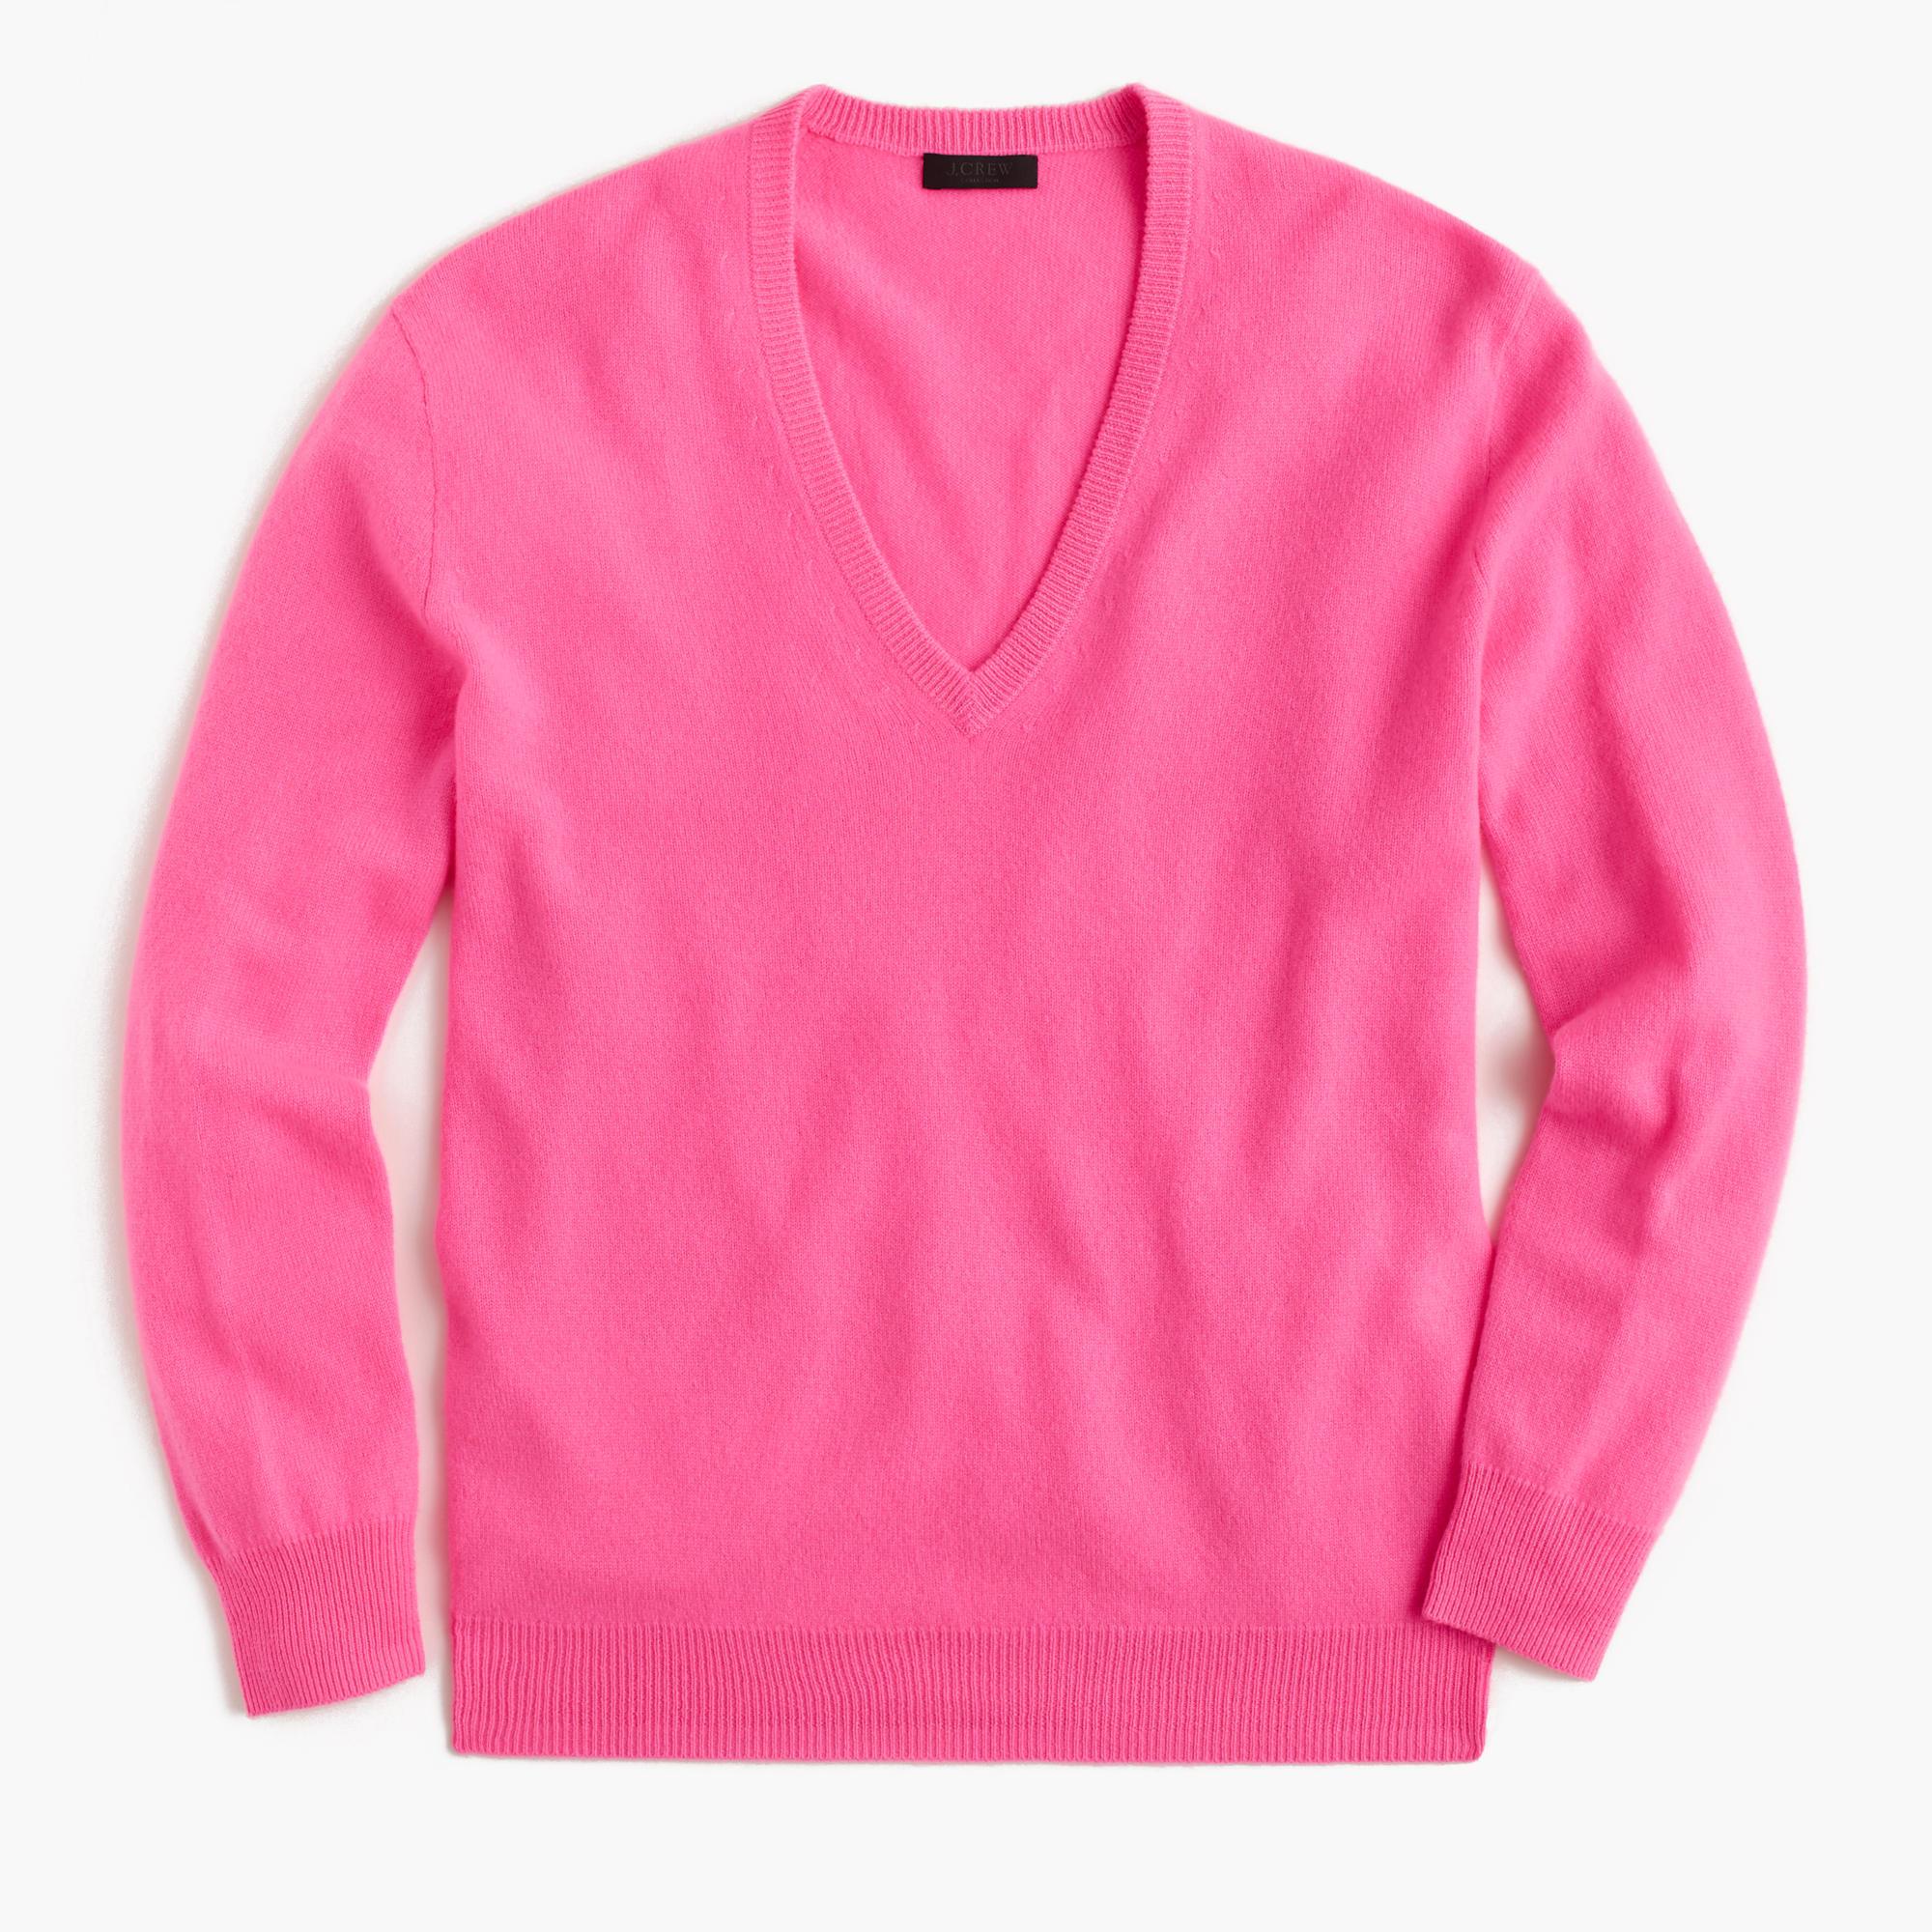 J.crew Italian Cashmere Boyfriend V-neck Sweater in Pink | Lyst